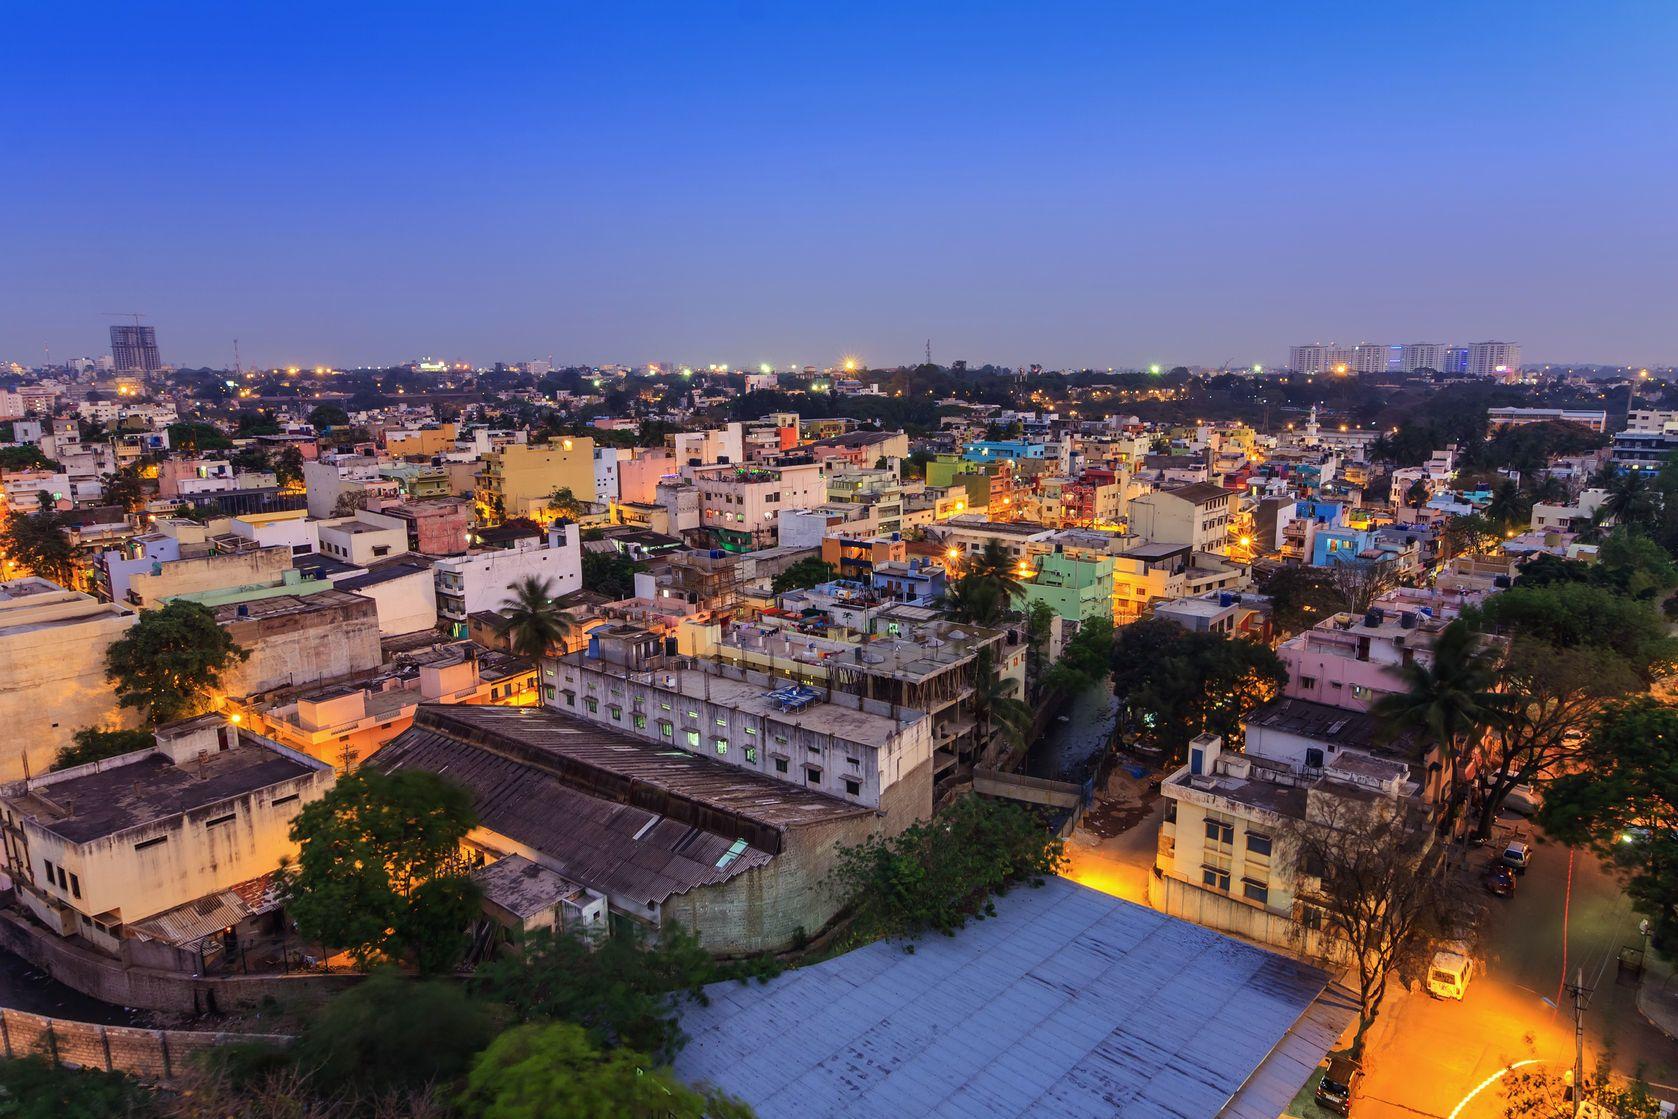 Panorama nočního Bengalúru v Indii | noppasinw/123RF.com